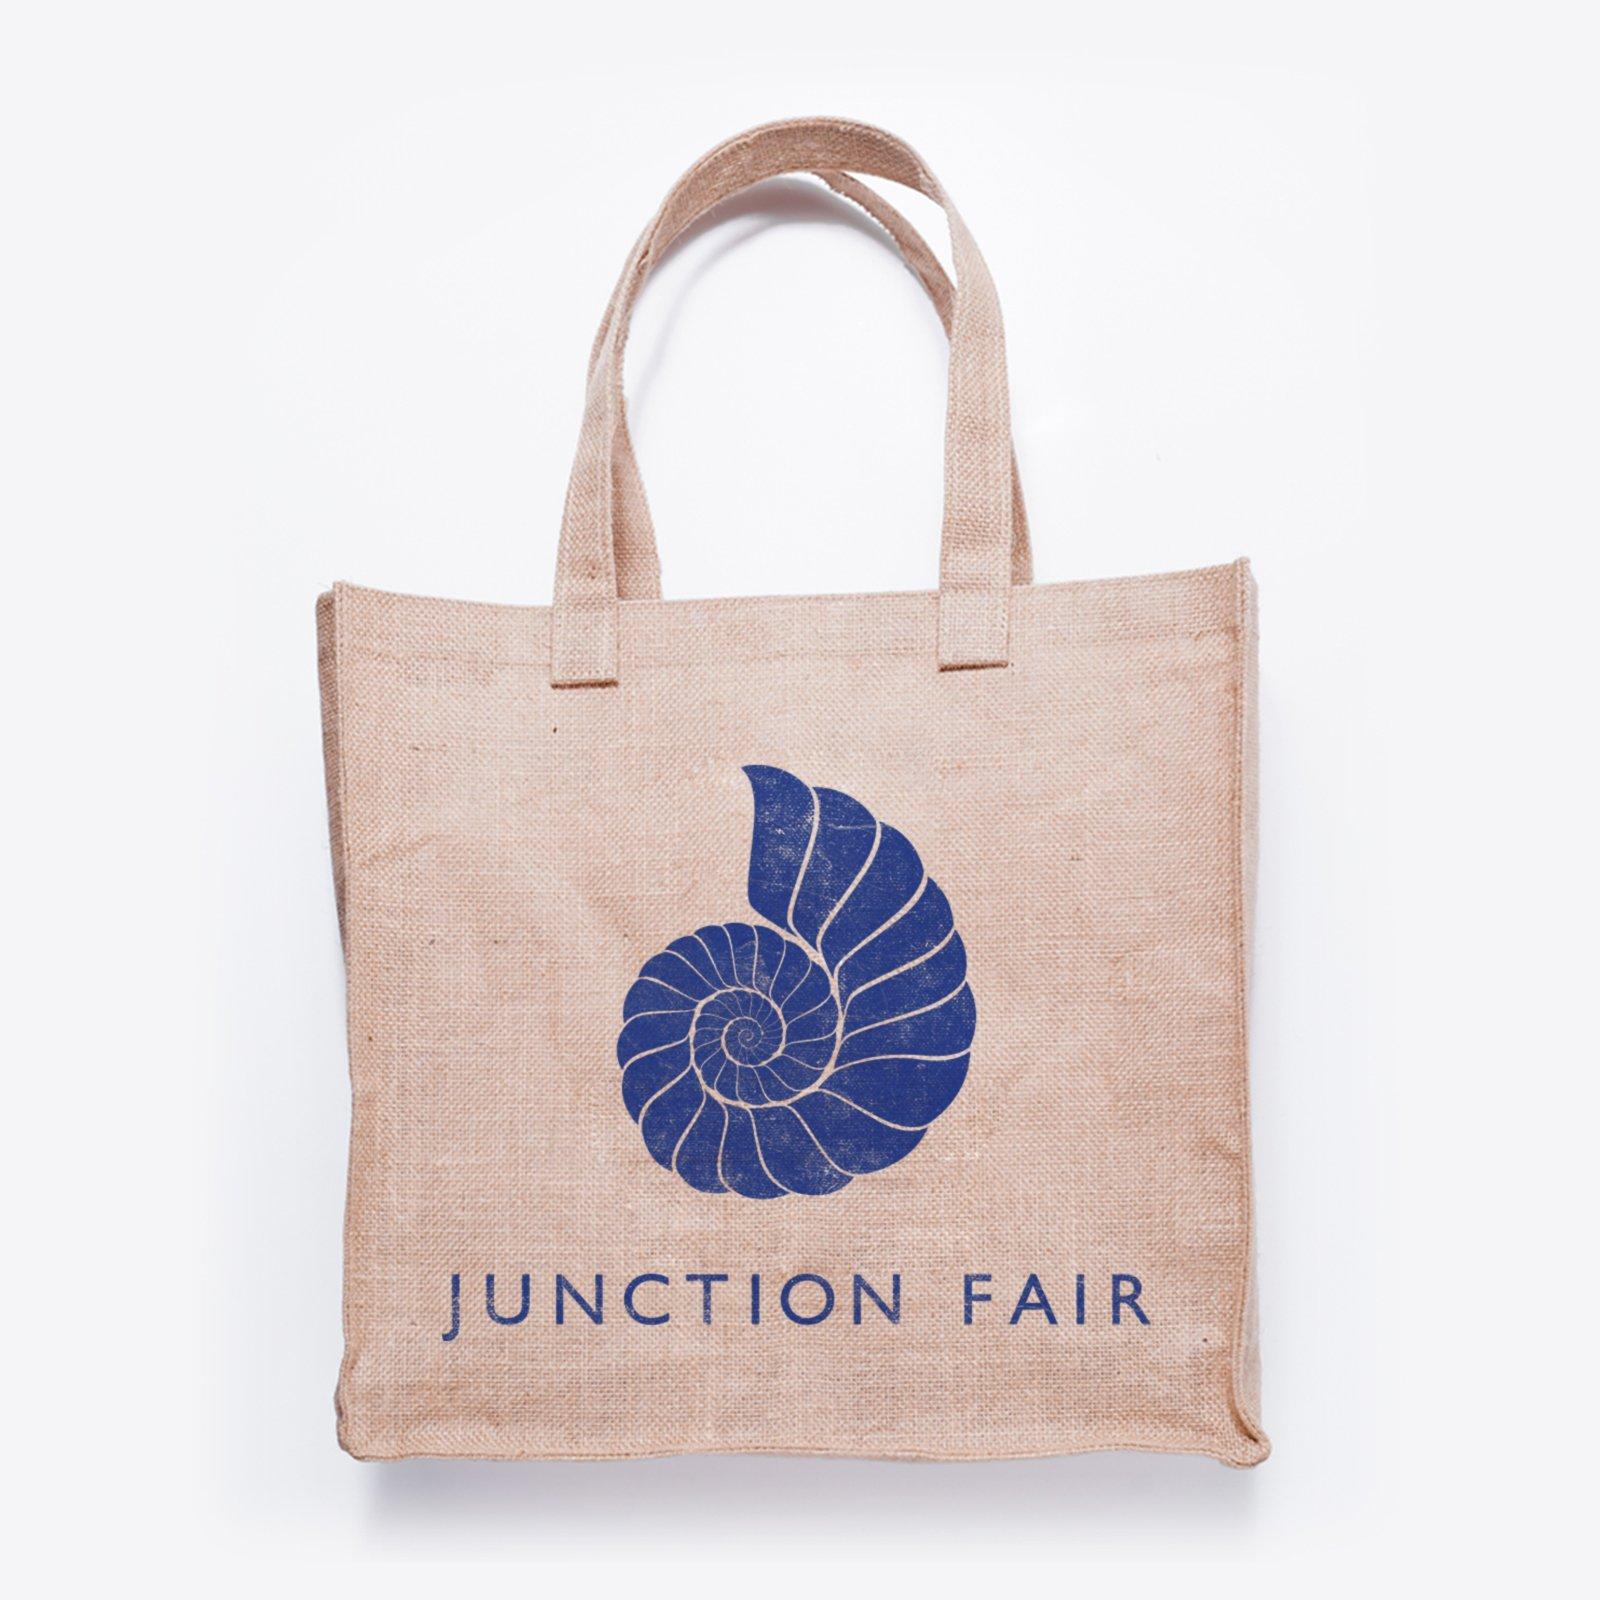 Junction Fair Jute Bag